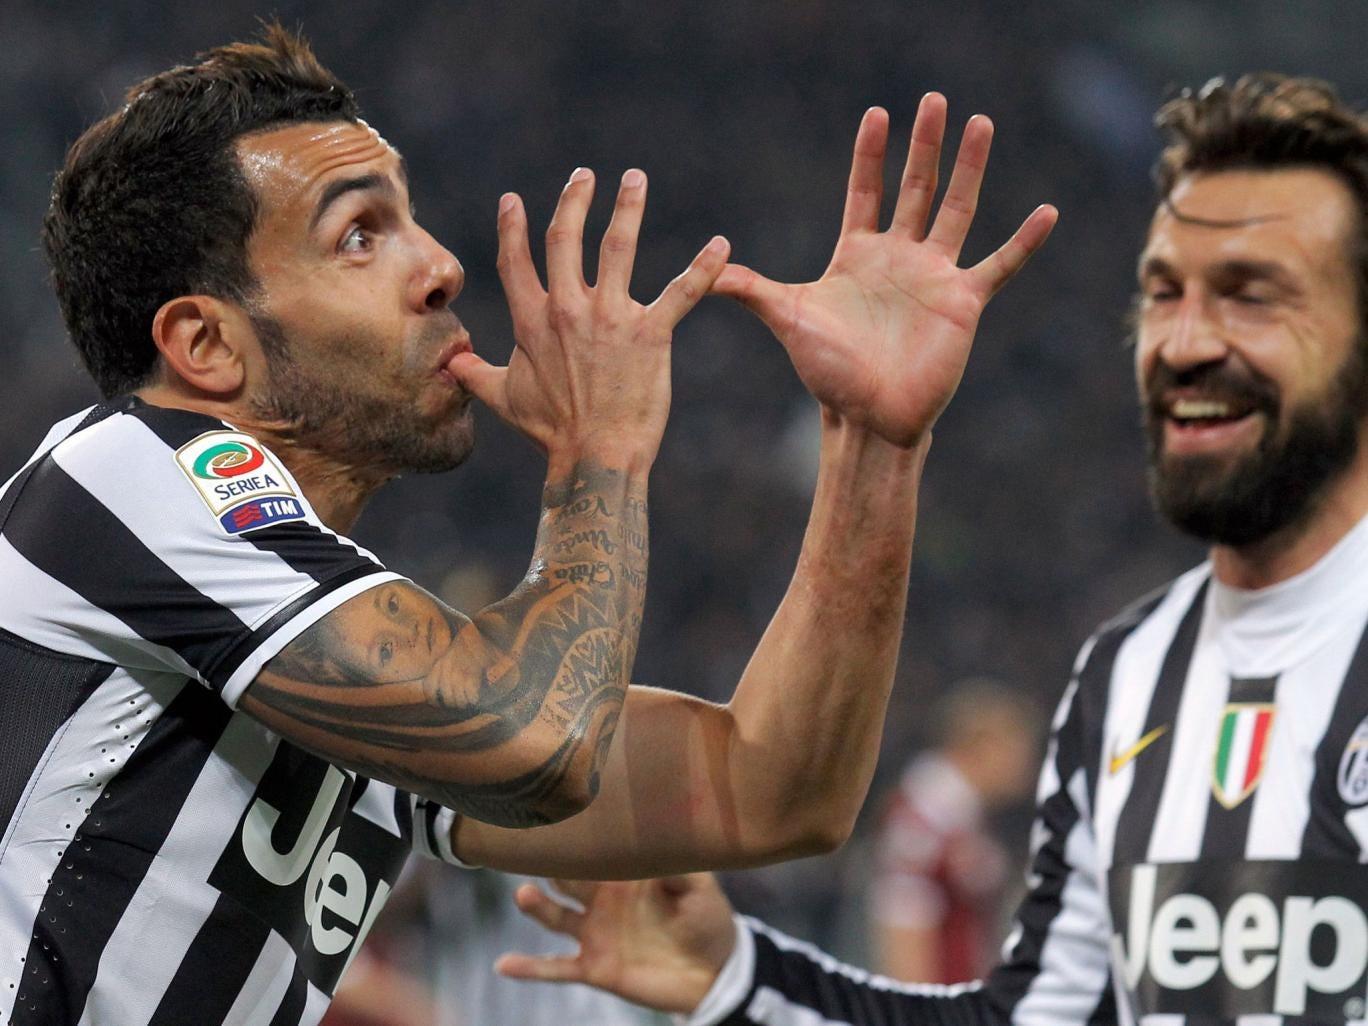 Juventus' Argentine forward Carlos Tevez celebrates after scoring during the Italian Serie A football match between Juventus and Torino at Juventus Stadium in Turin